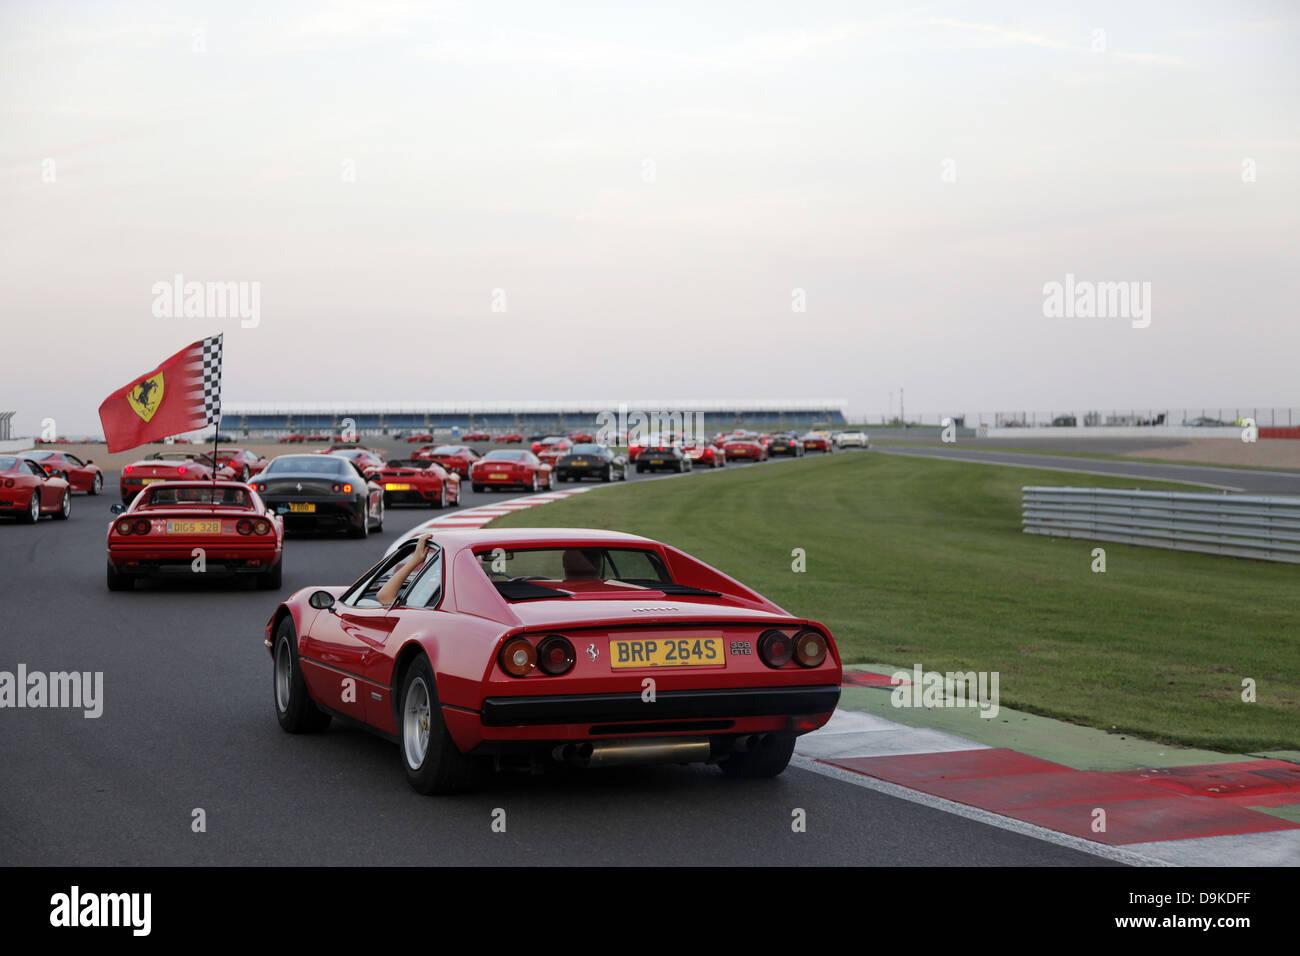 RED FERRARI 308 GTB CAR FERRARI WORLD RECORD FERRARI WORLD RECORD SILVERSTONE GRAND PRIX CIRCUIT ENGLAND ENGLAND - Stock Image